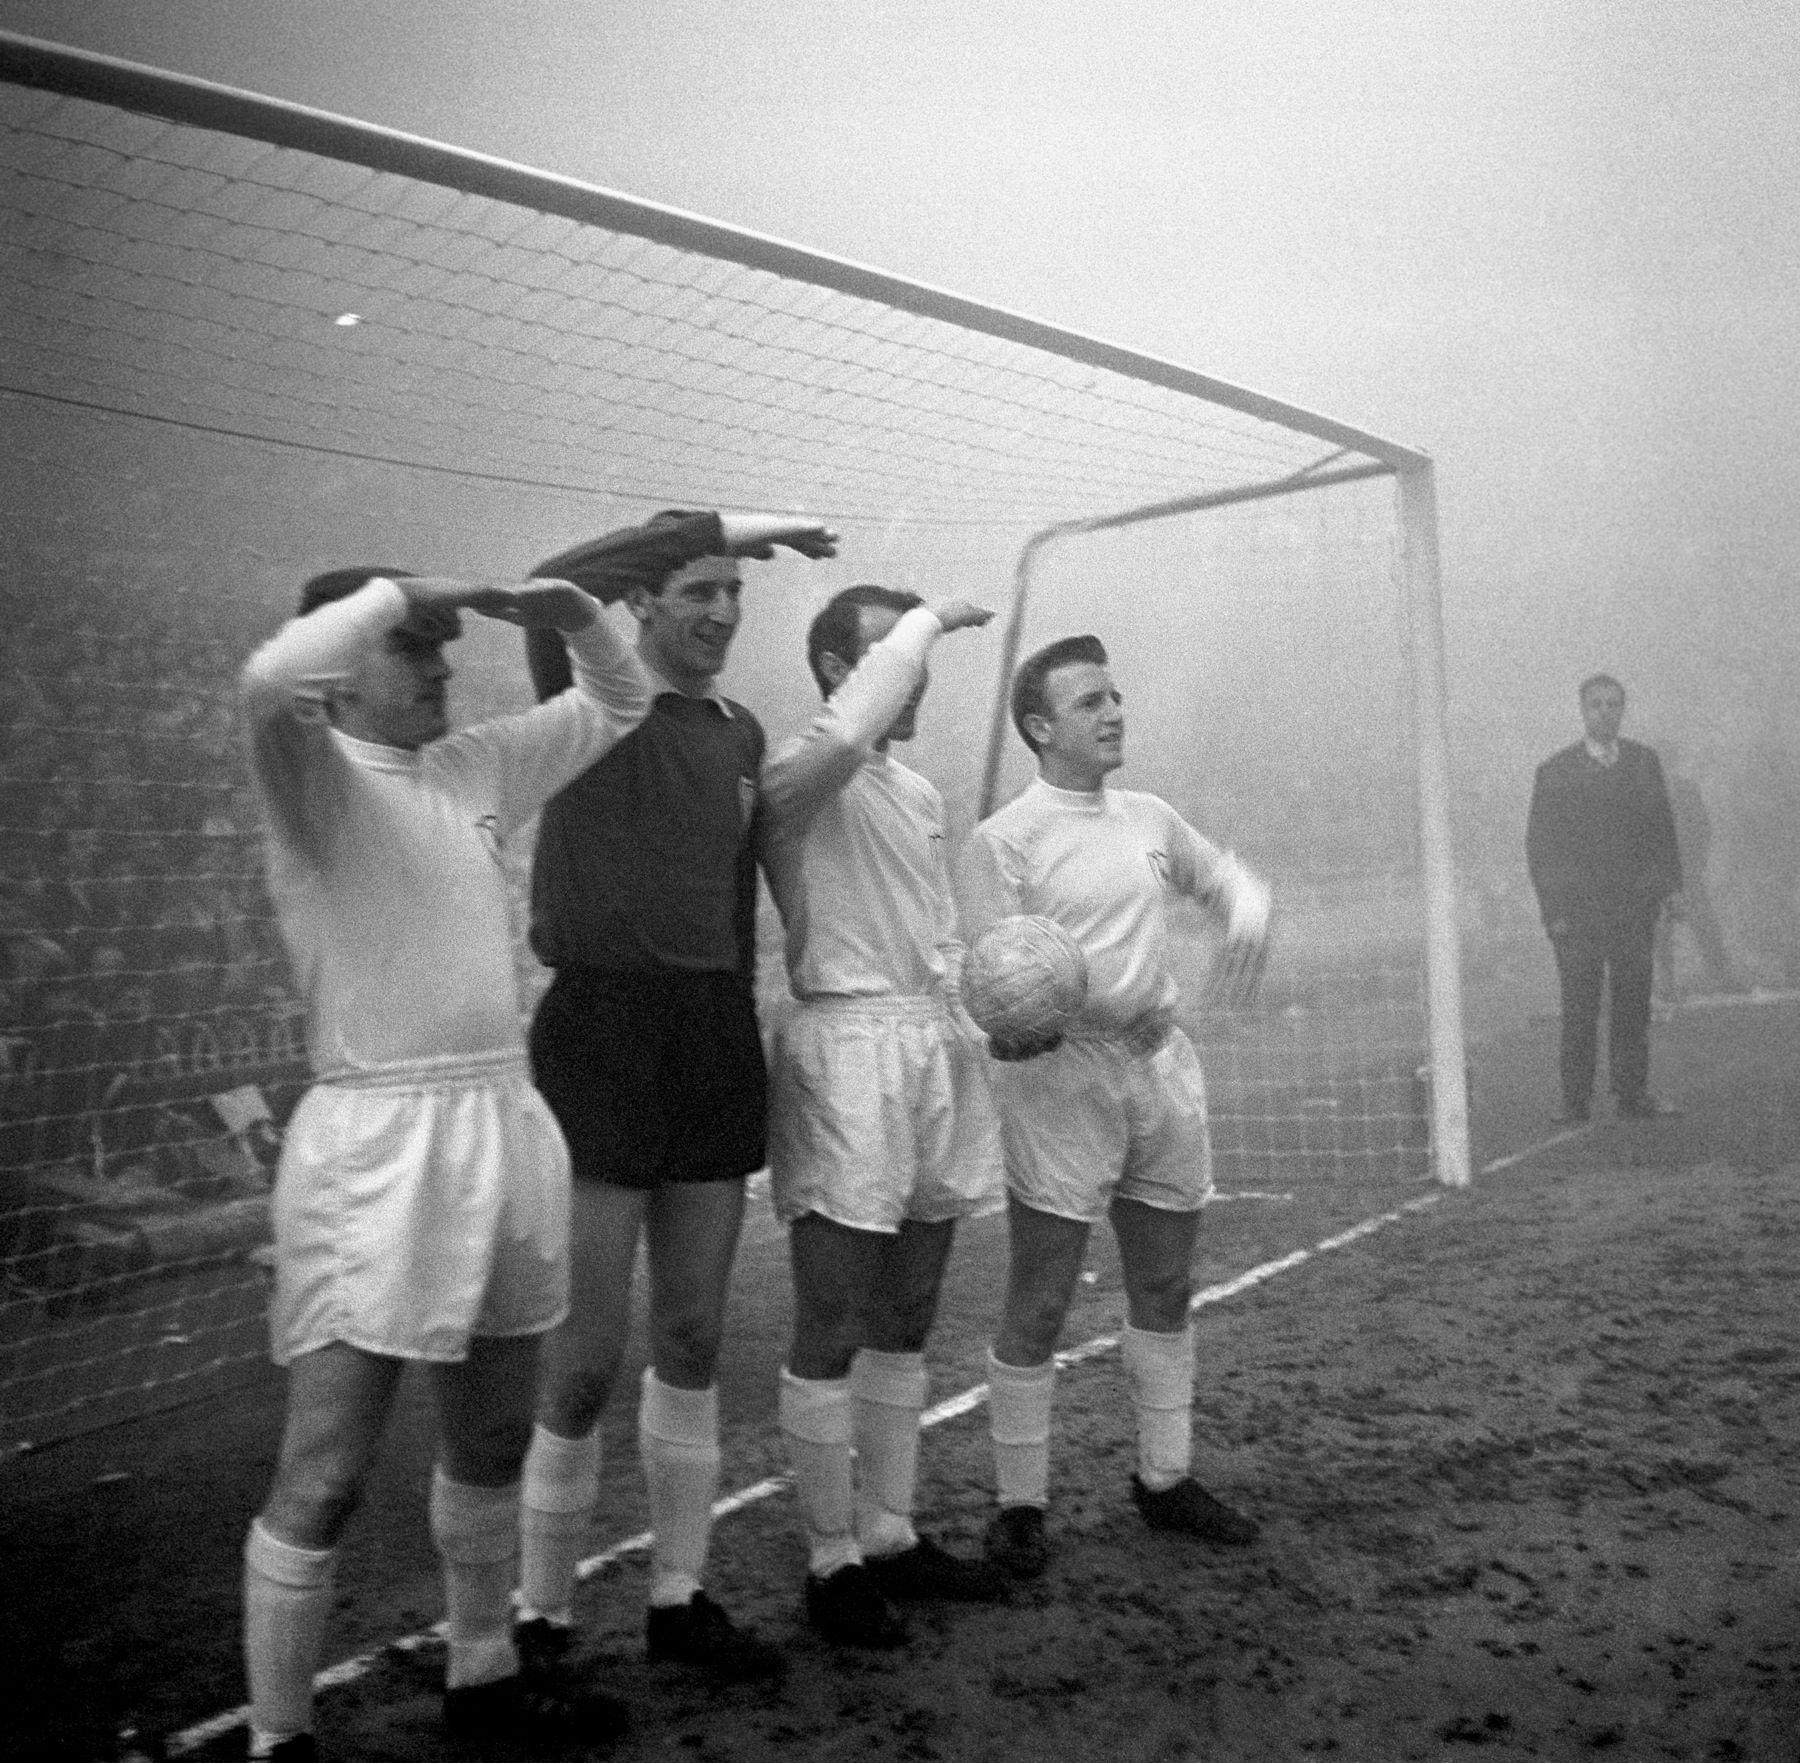 November 11 1963 Tottenham Hotspur Lose Manchester United In The Fog Flashbak Tottenham Hotspur Tottenham Hotspur Football White Hart Lane